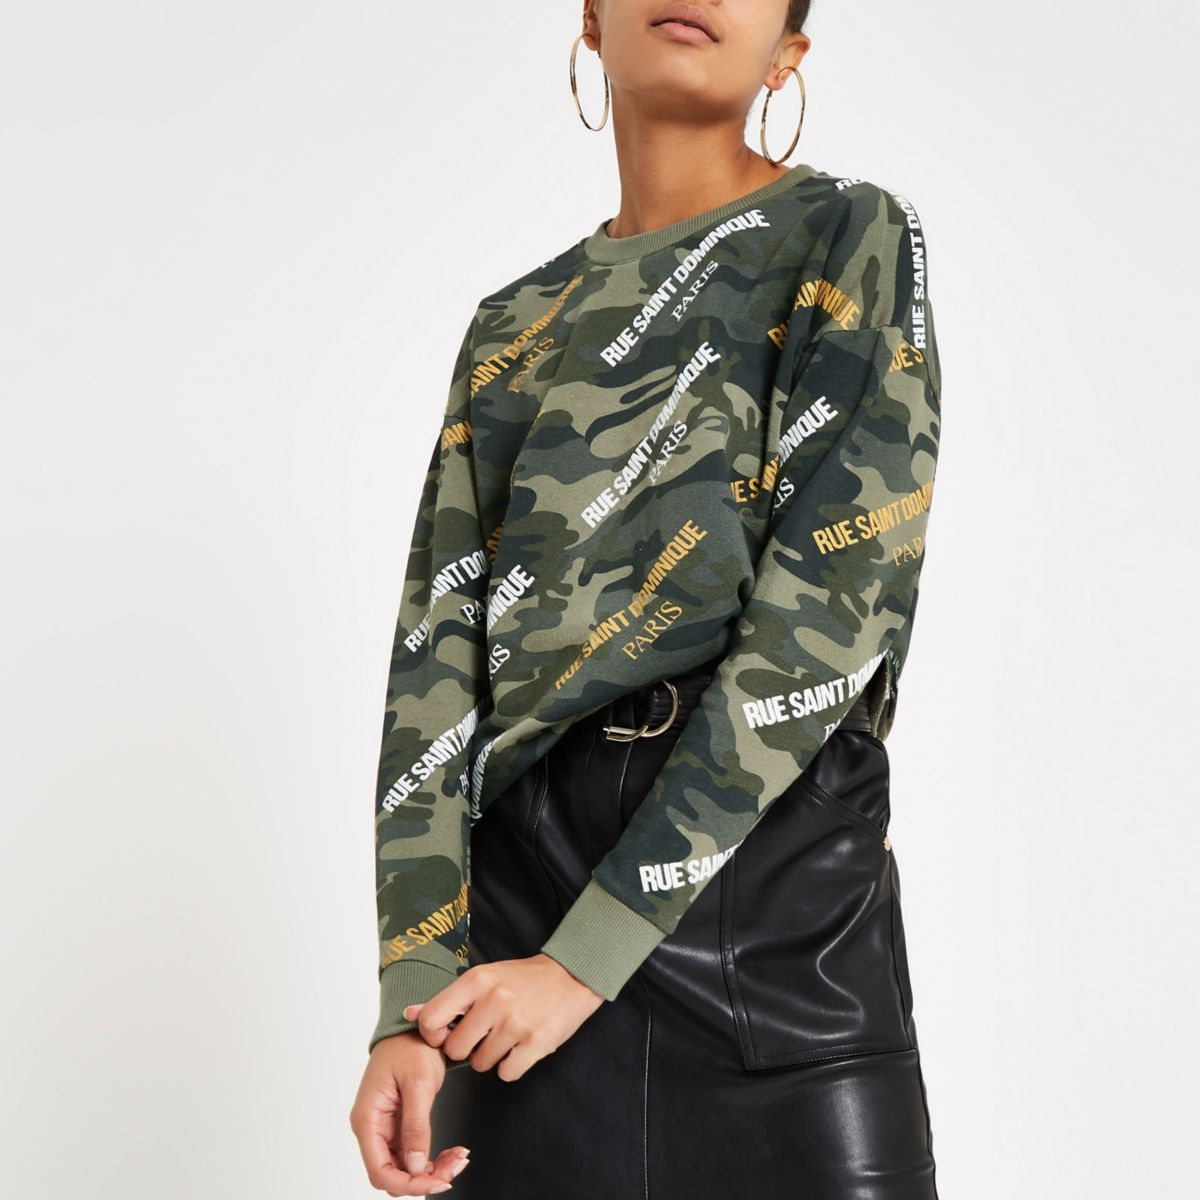 Khaki camo 'Rue Saint Dominique' sweatshirt